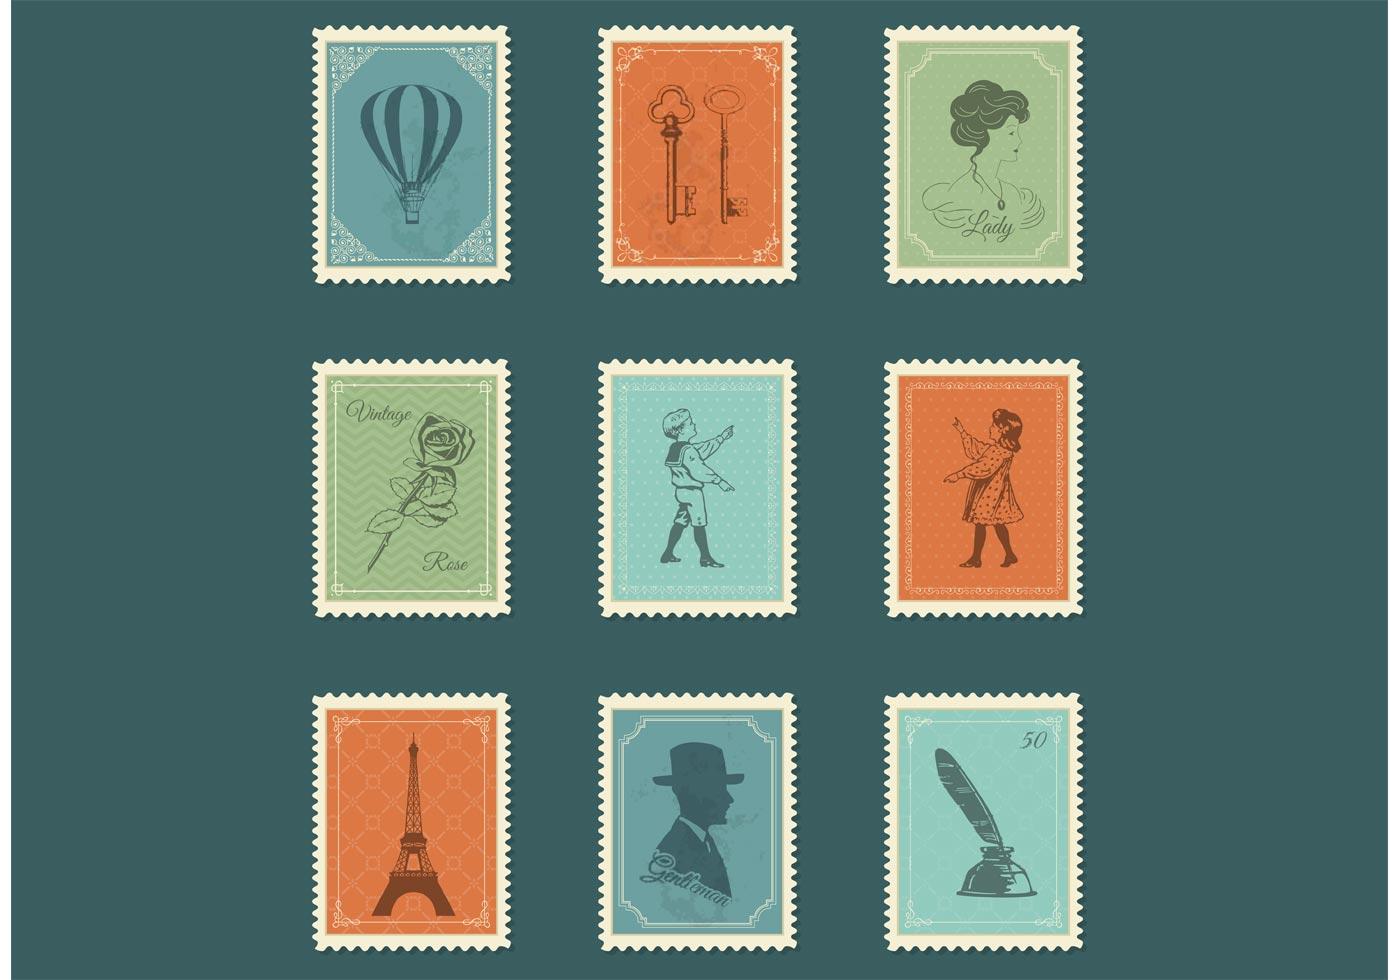 Free Vintage Postage Stamp Vectors - Download Free Vector ...